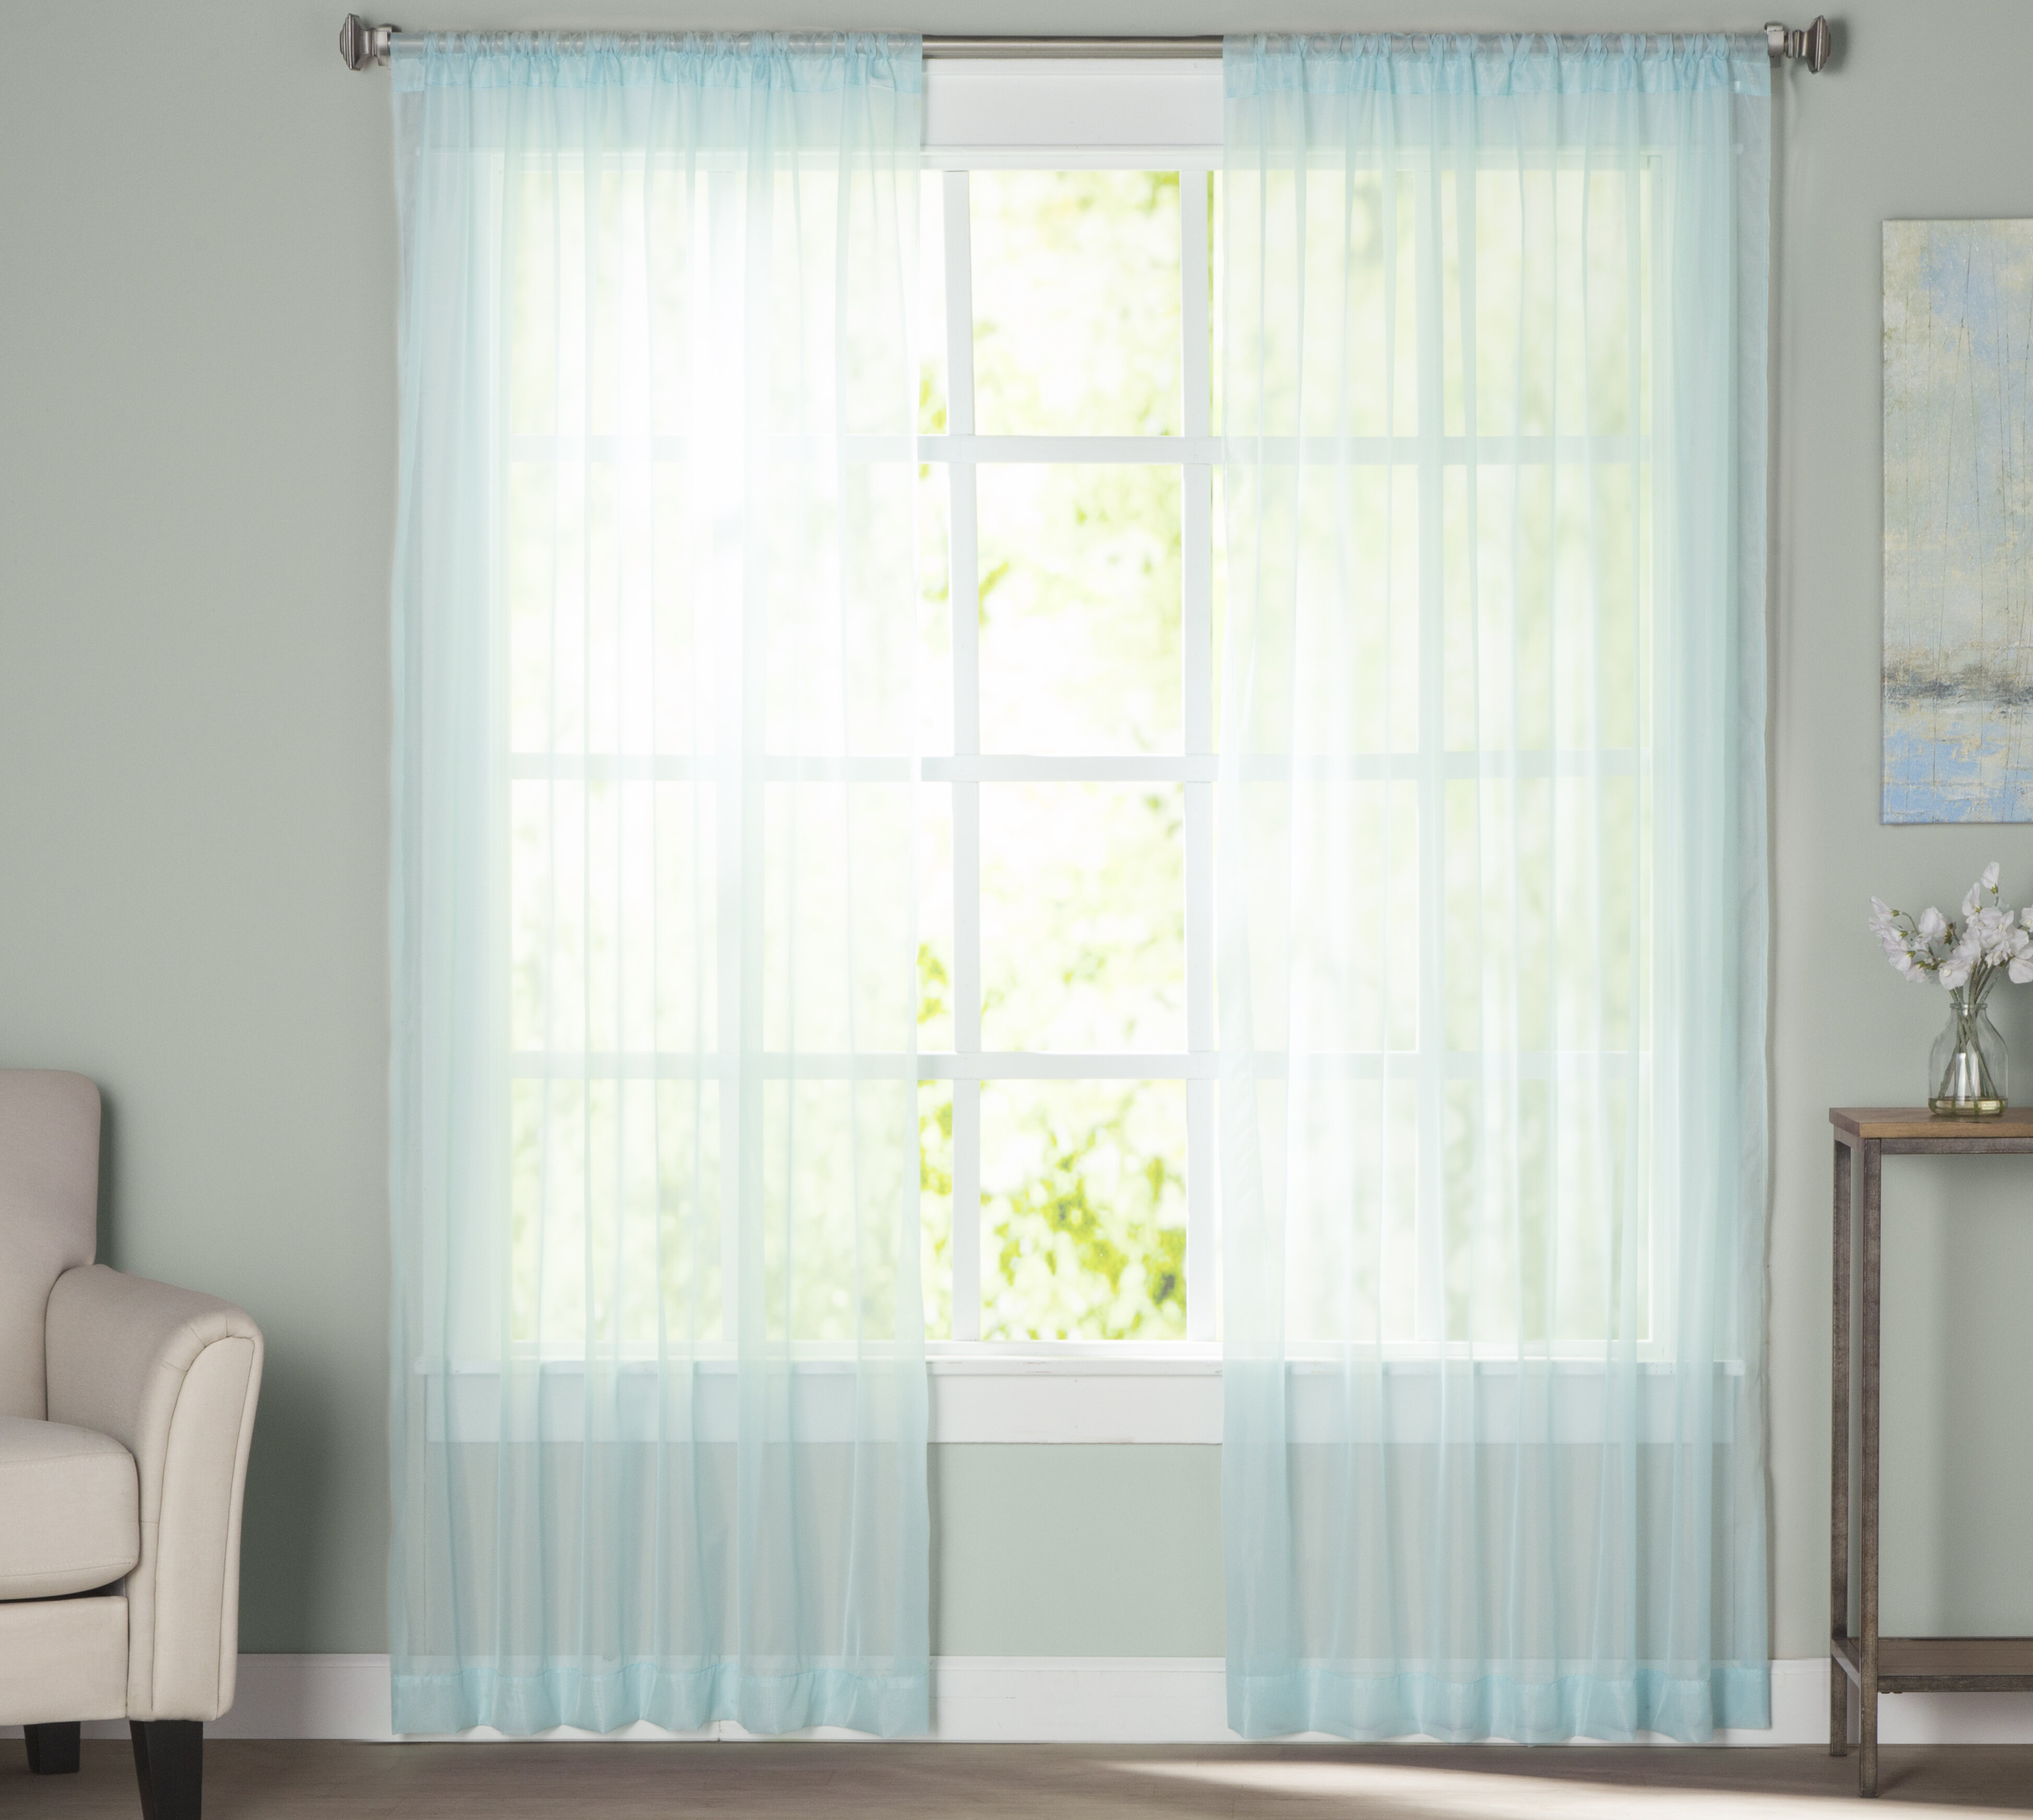 Blue Sheer Curtains Drapes You Ll Love In 2021 Wayfair